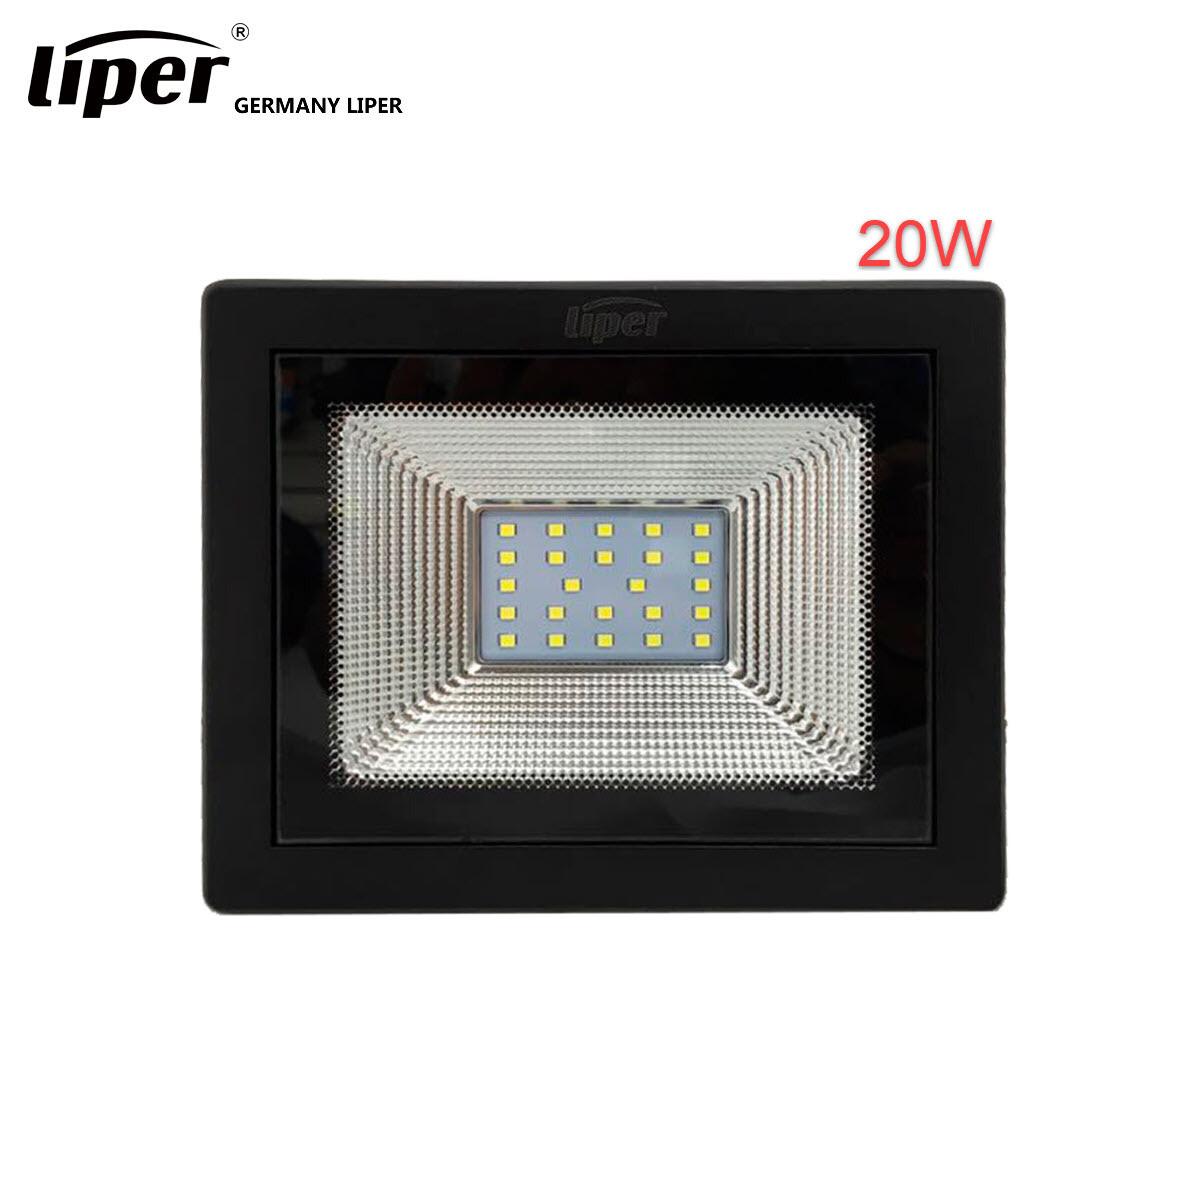 Refletor Holofote Liper 20W 220V